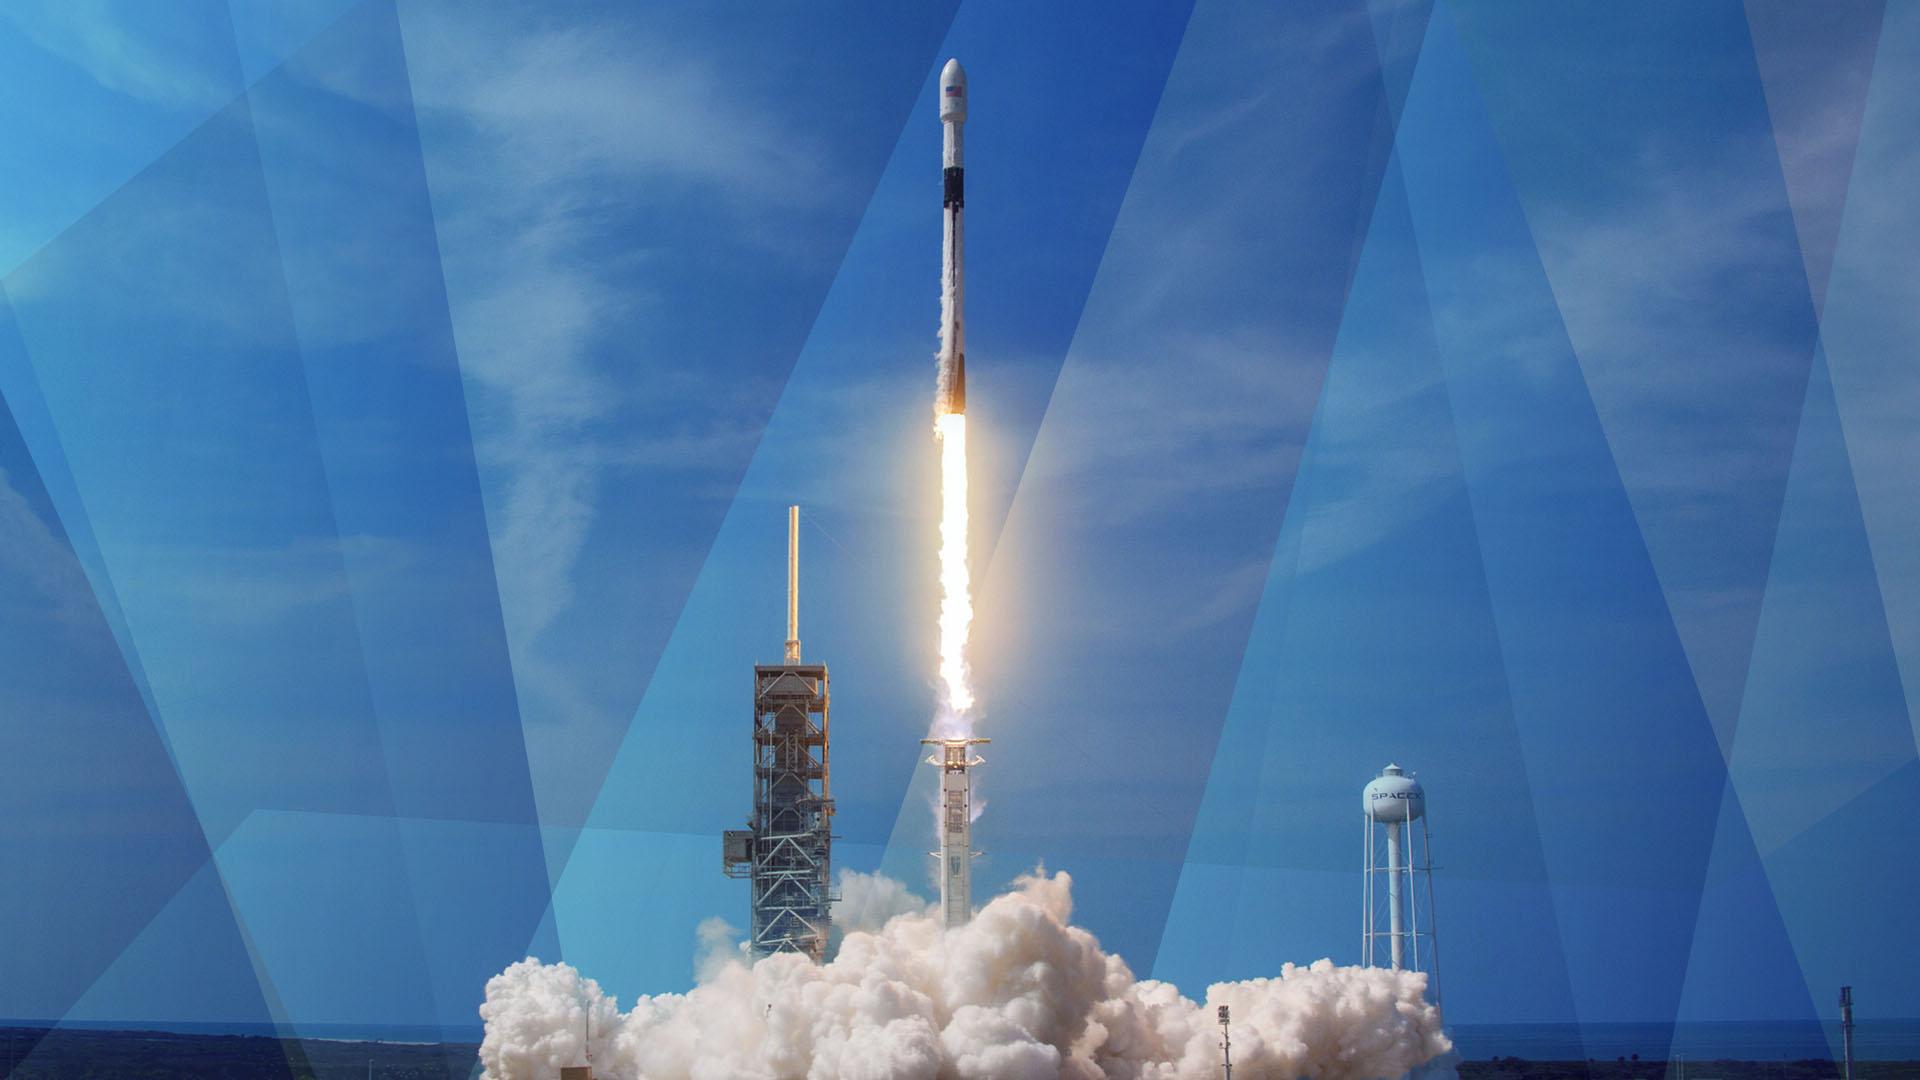 Weltraum, Raumfahrt, Spacex, Rakete, Spaceship, Raketenstart, Falcon